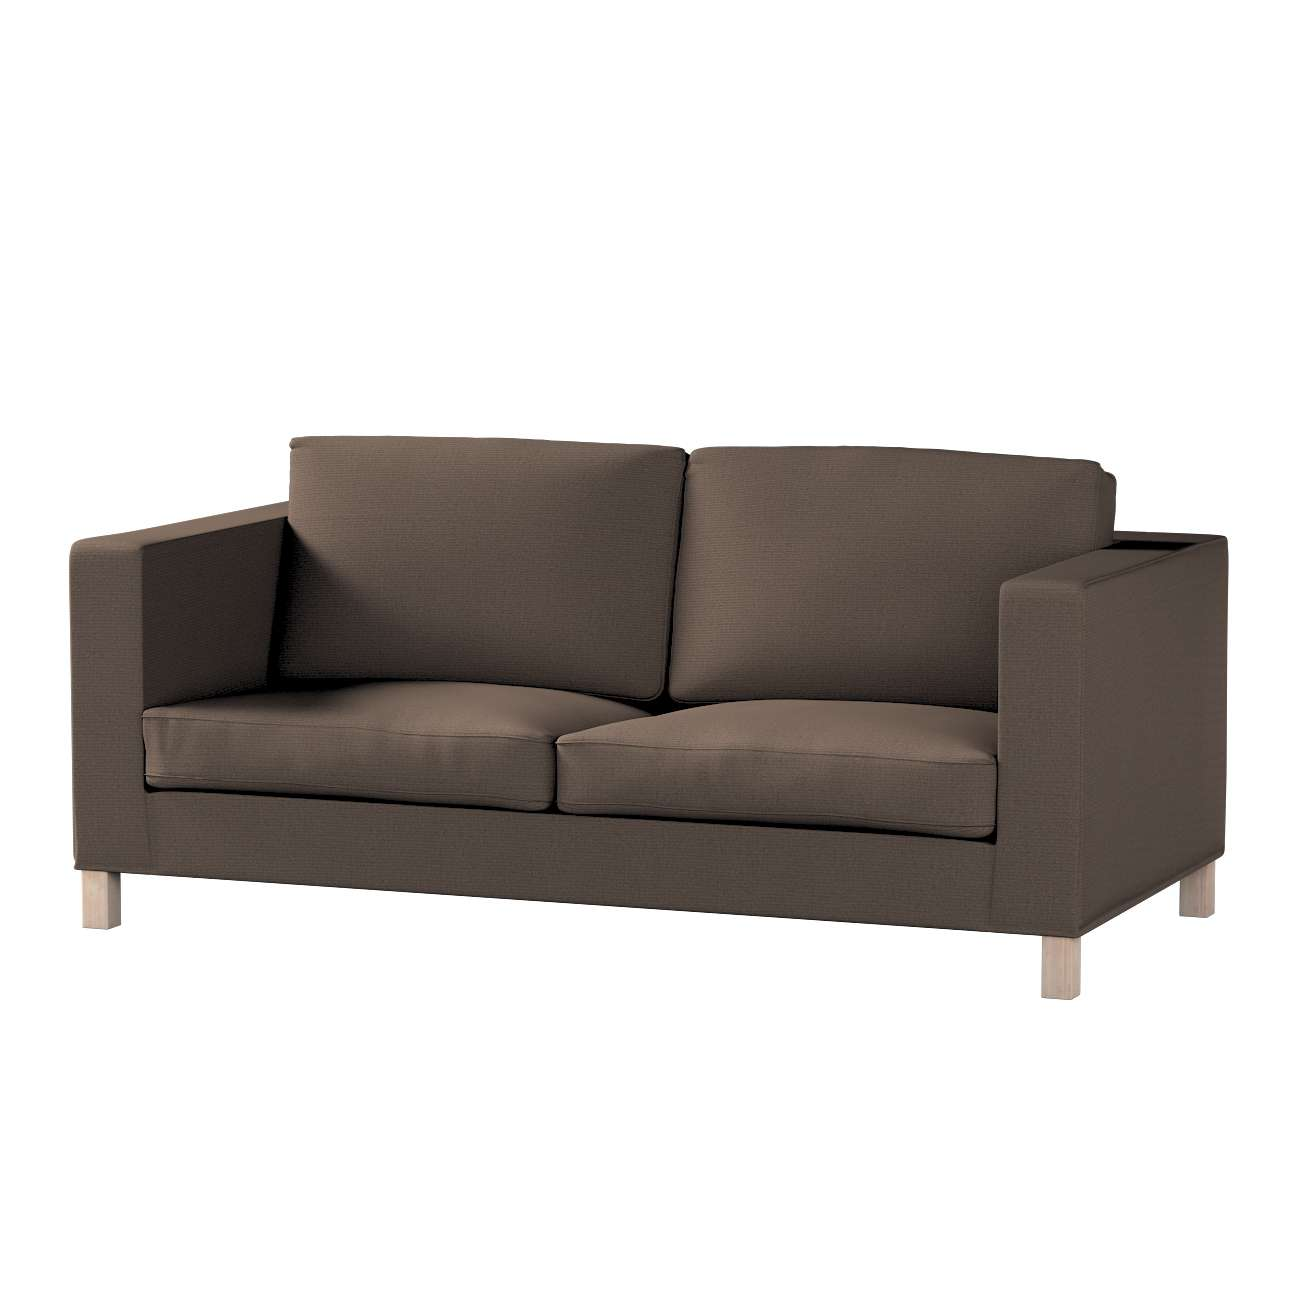 Potah na pohovku IKEA  Karlanda rozkládací, krátký pohovka Karlanda rozkládací v kolekci Etna, látka: 705-08